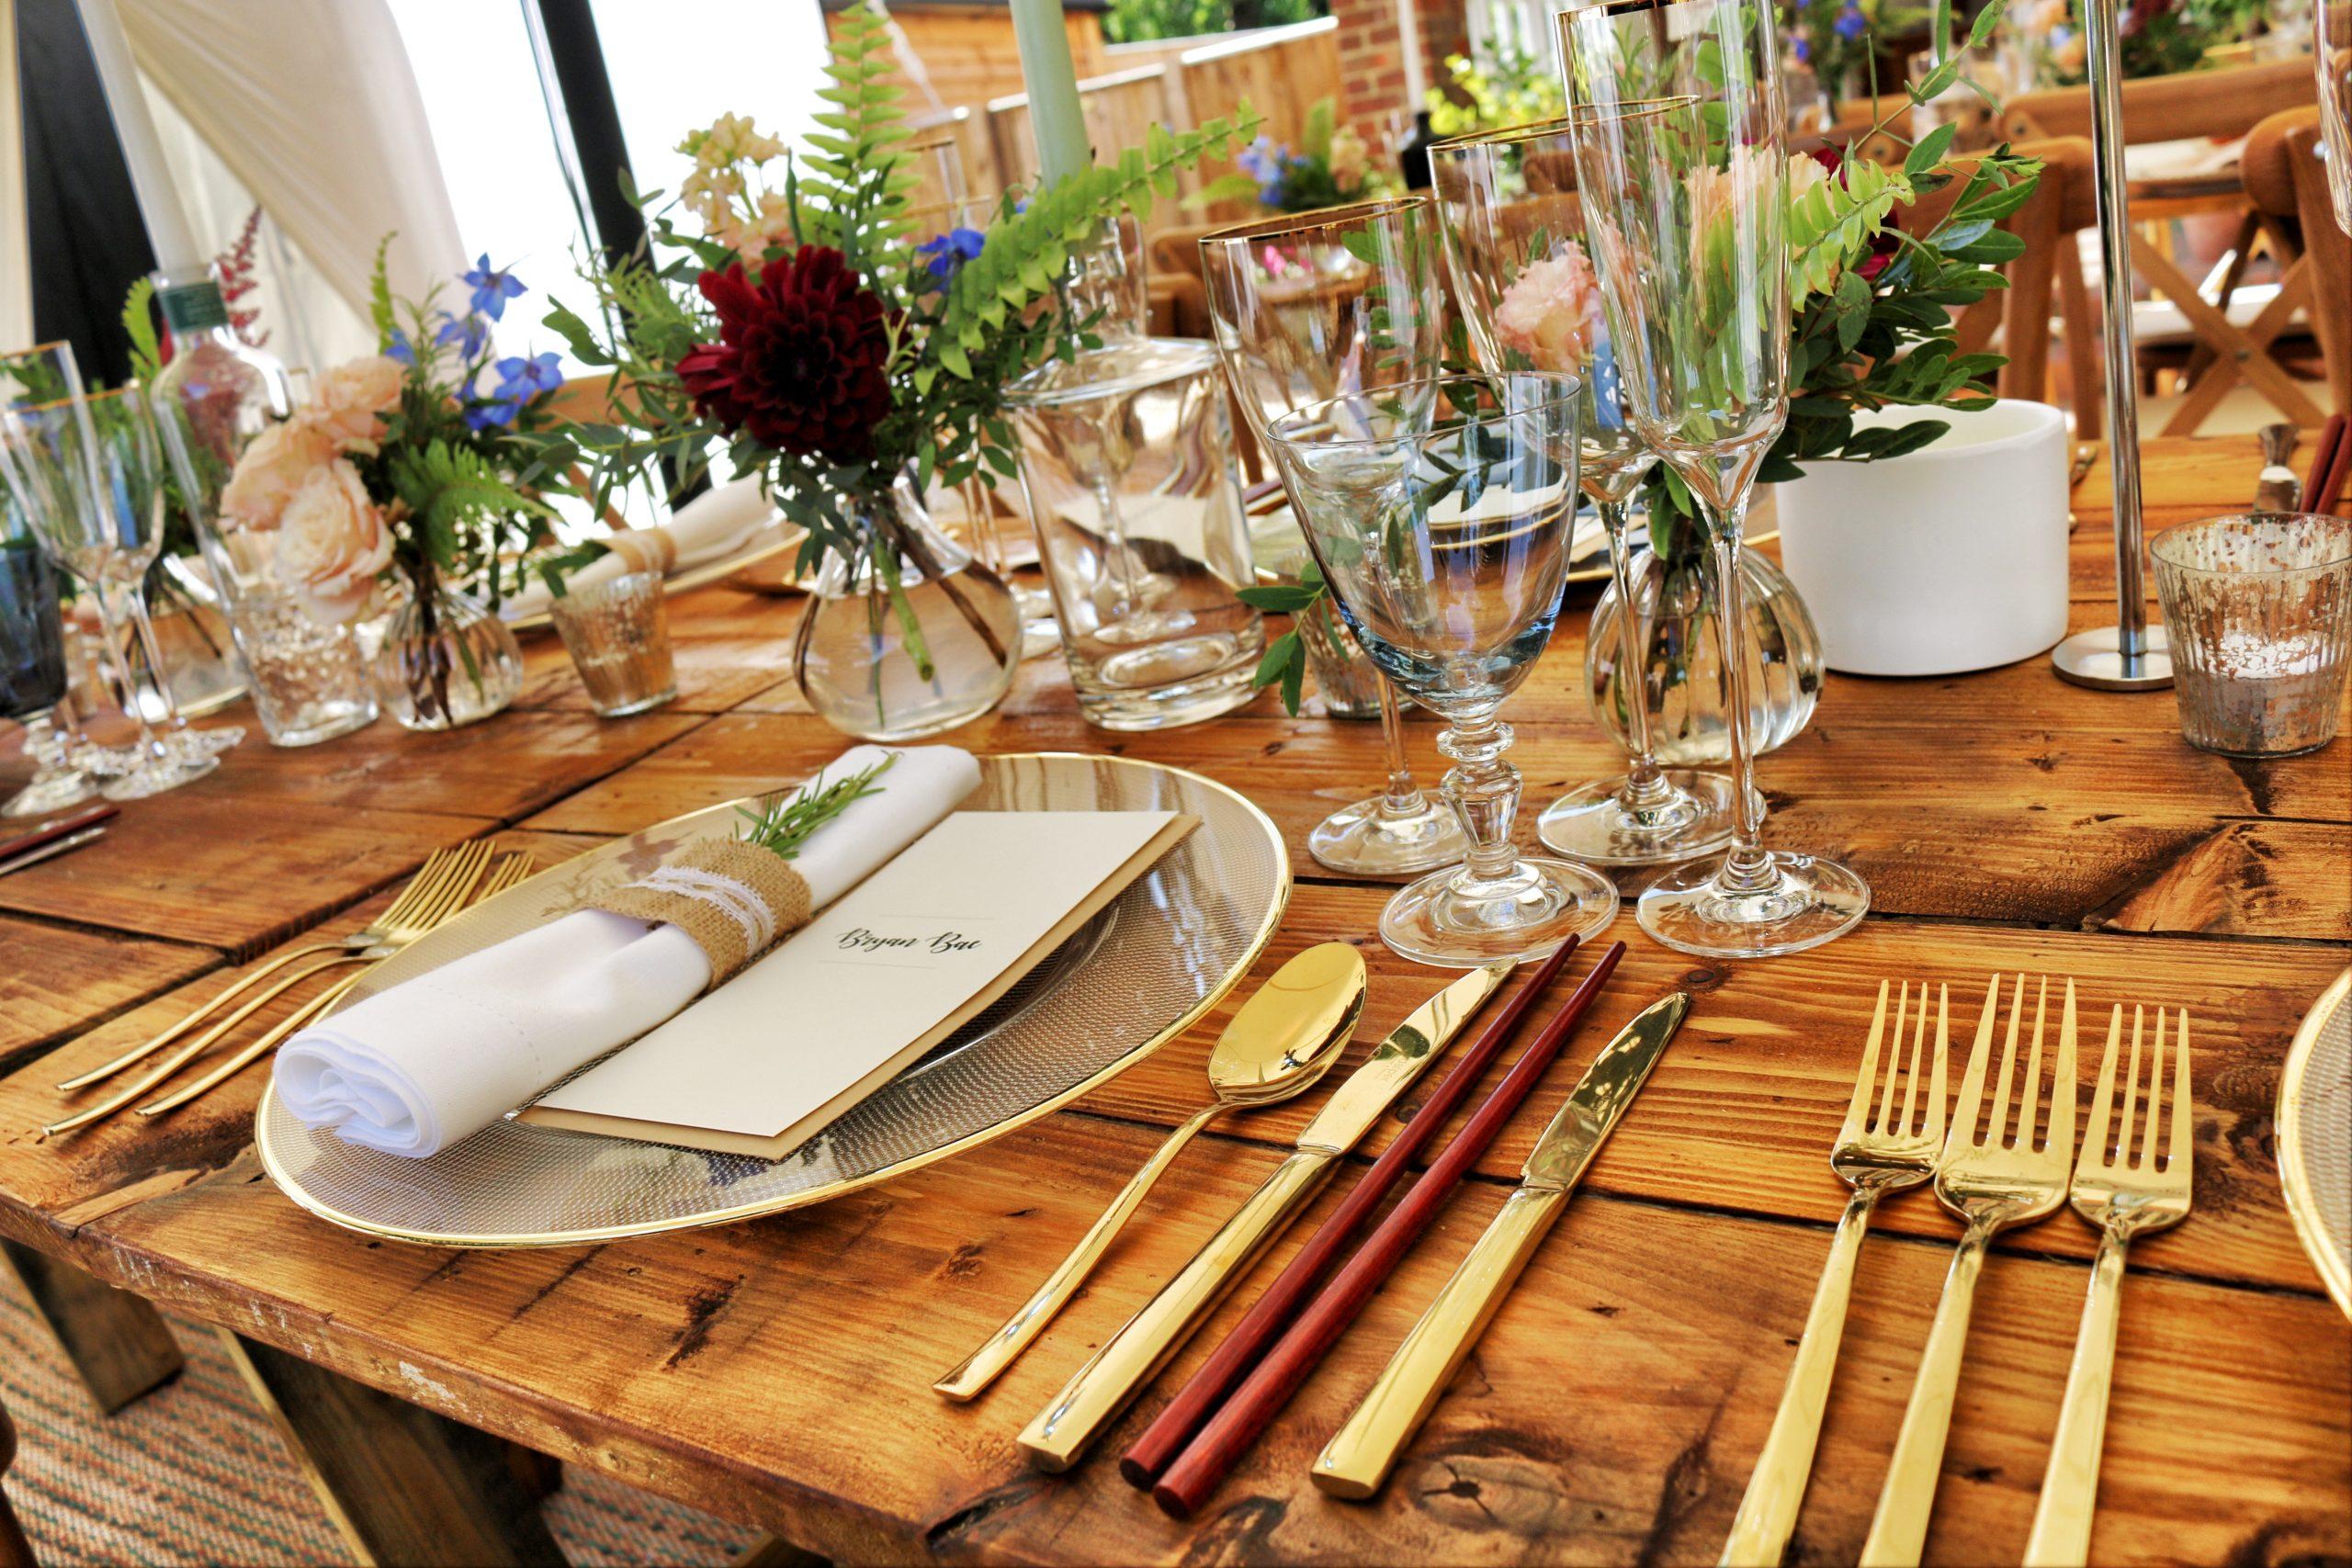 dinnerware-on-table-top-1395964